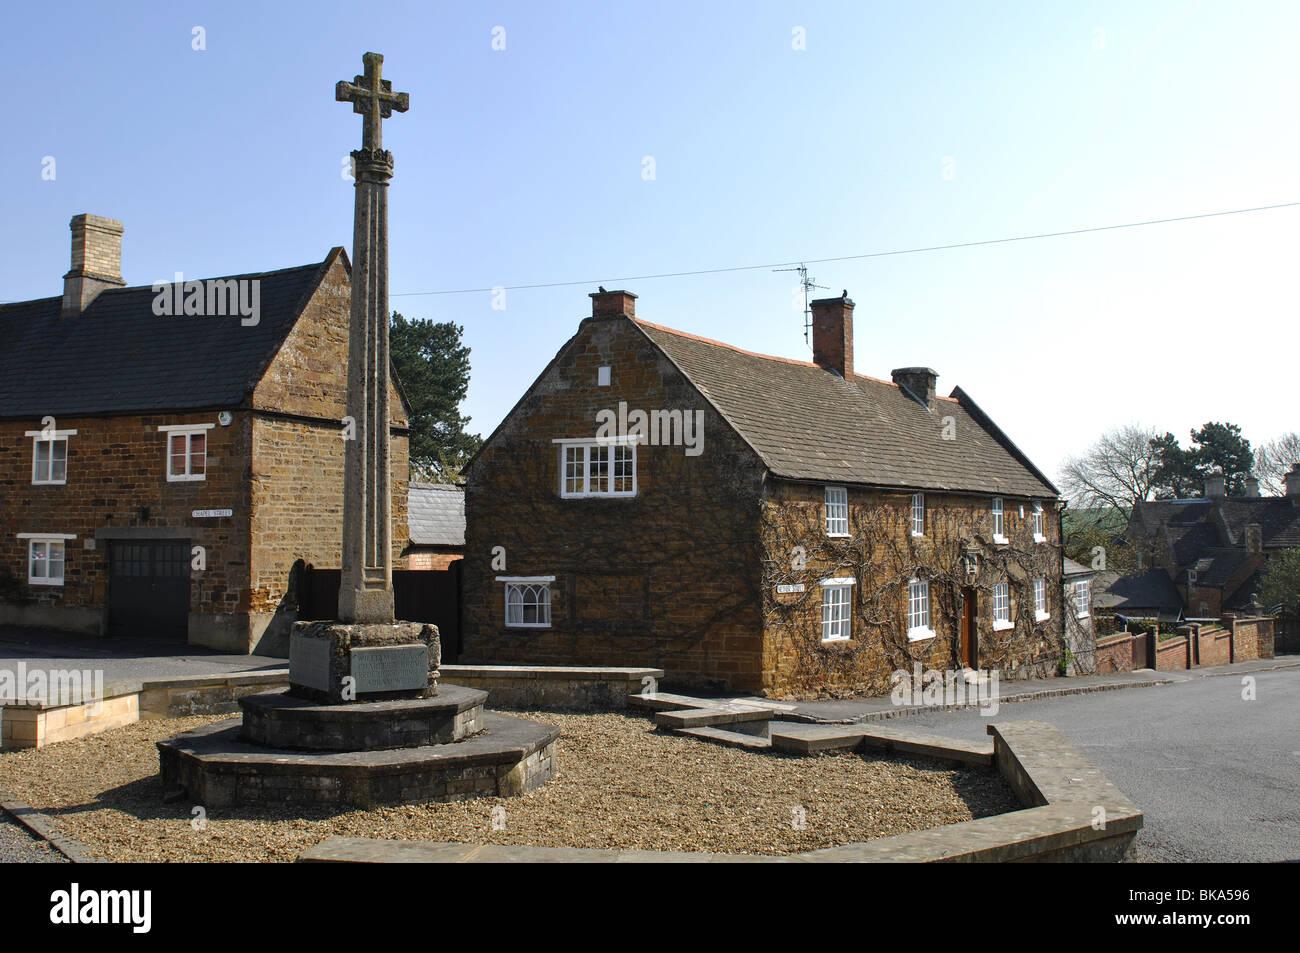 Belton-in-Rutland village centre, Rutland, England, UK - Stock Image